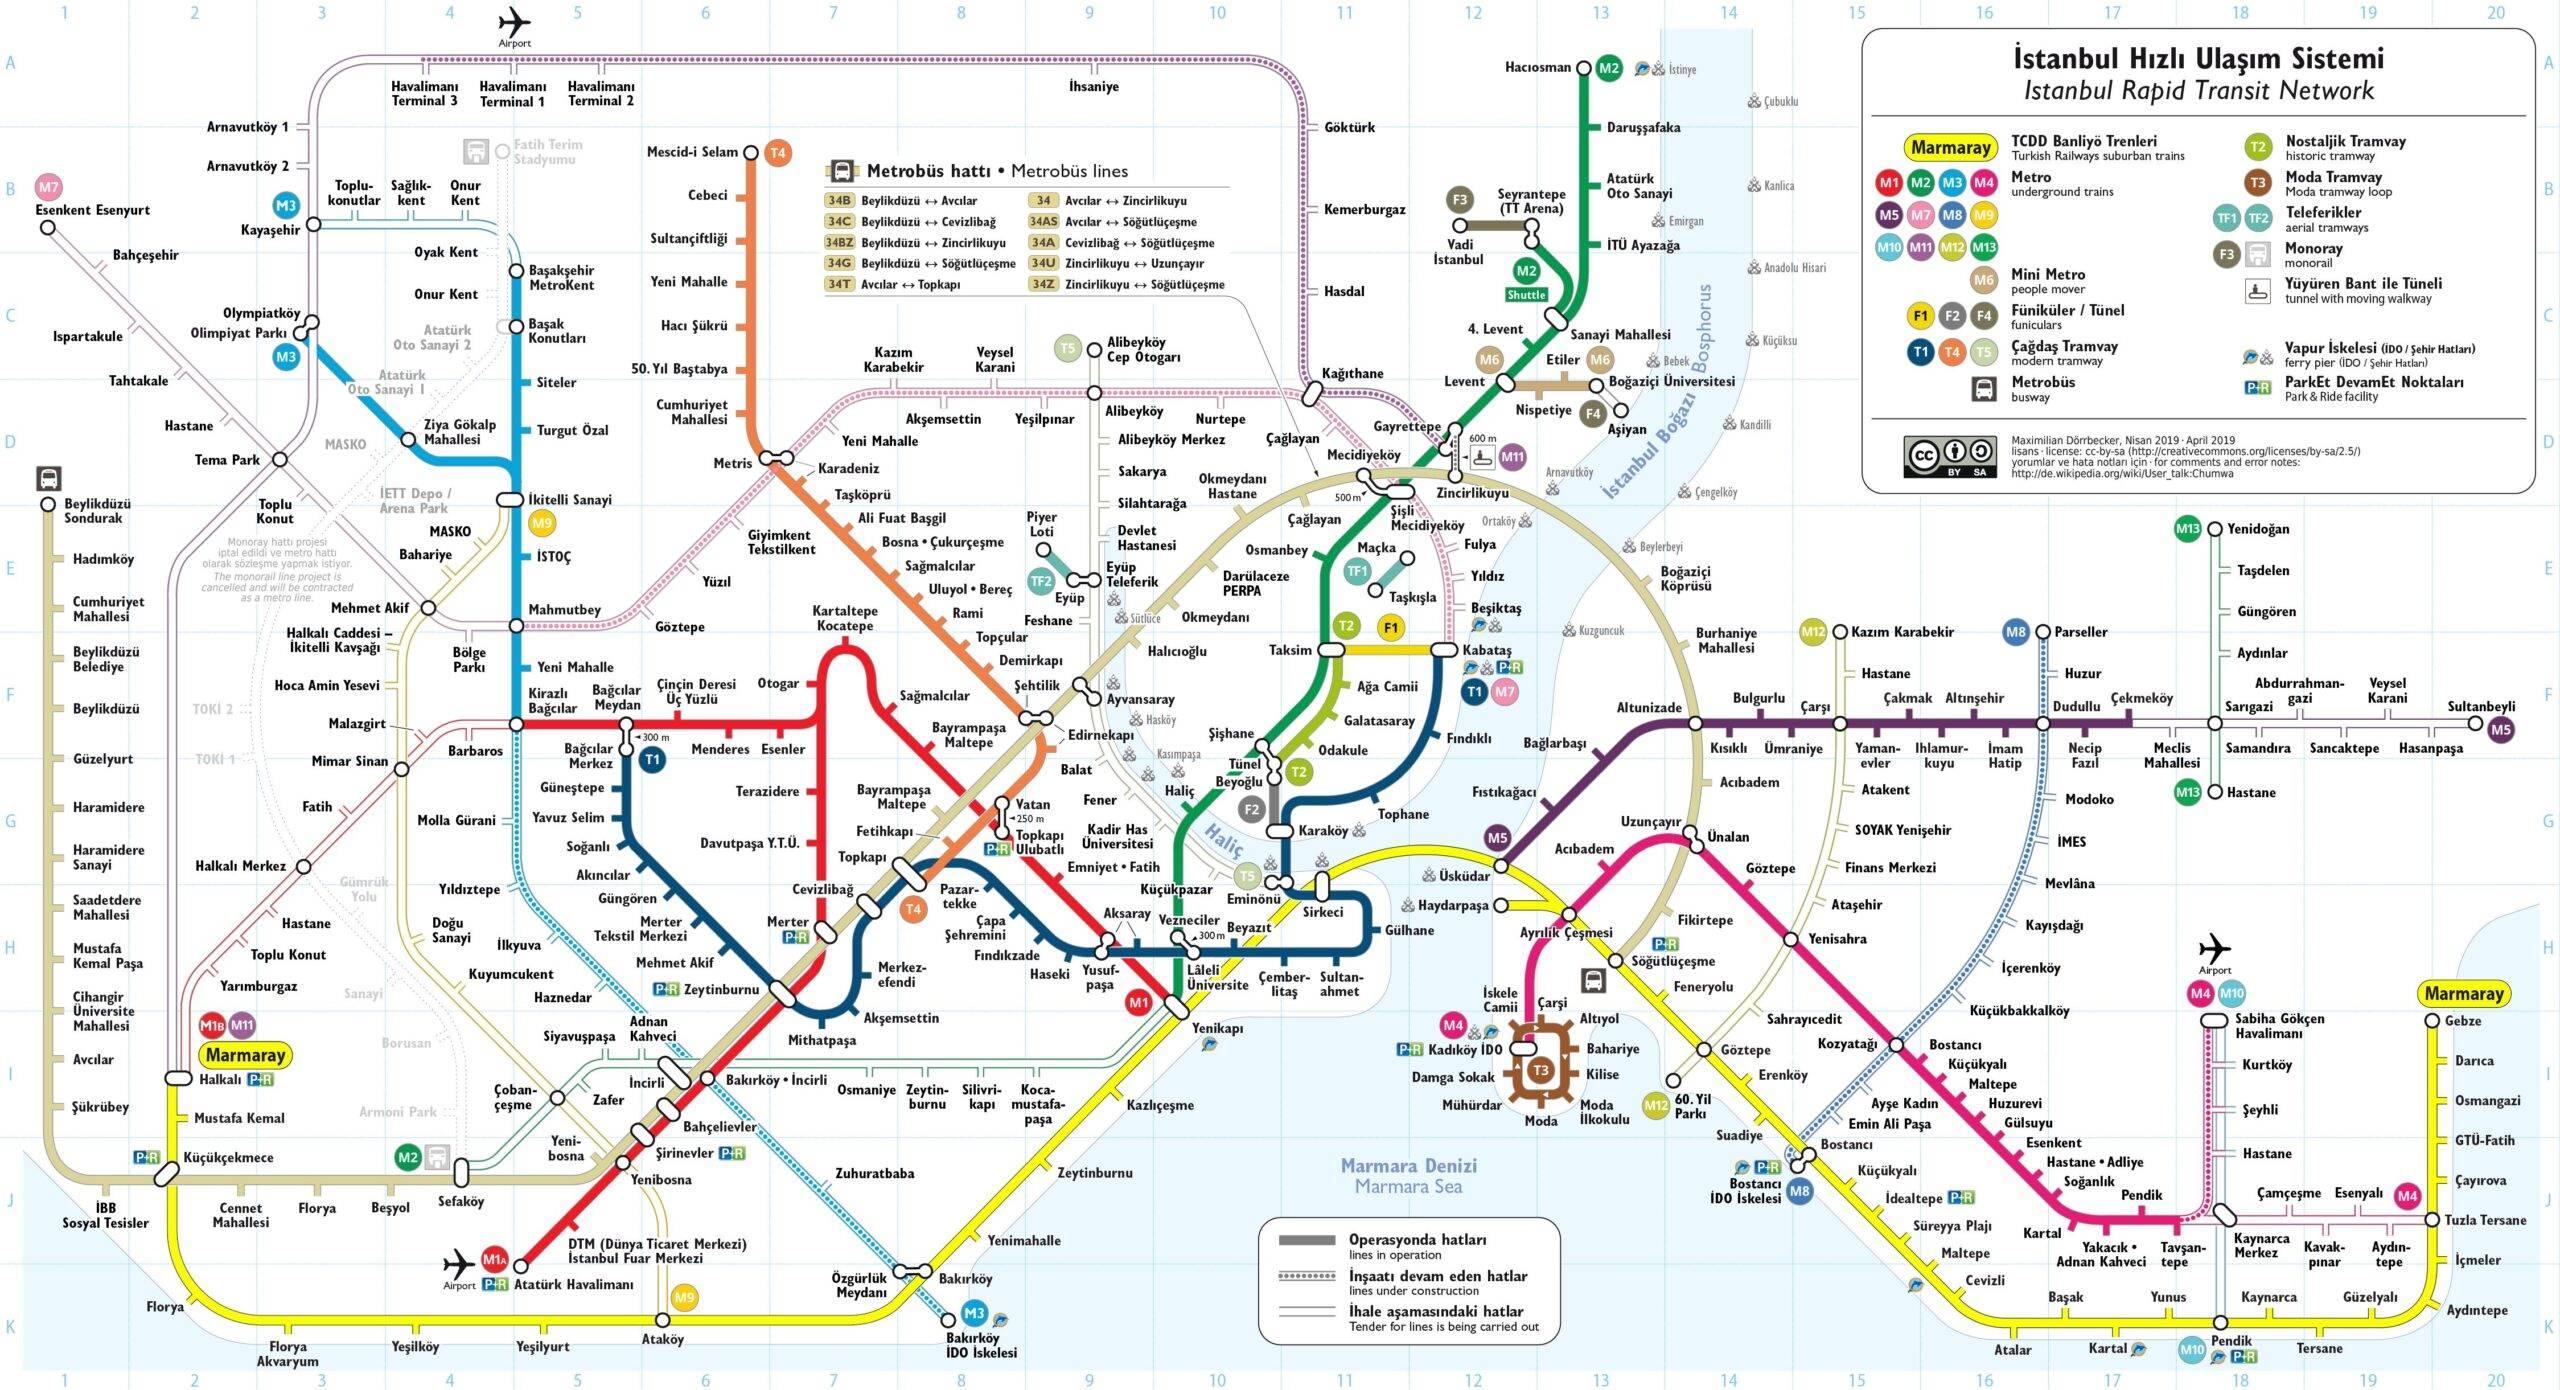 Istanbulkart, стоимость проезда в стамбуле на метро, трамвае, автобусах - 2021